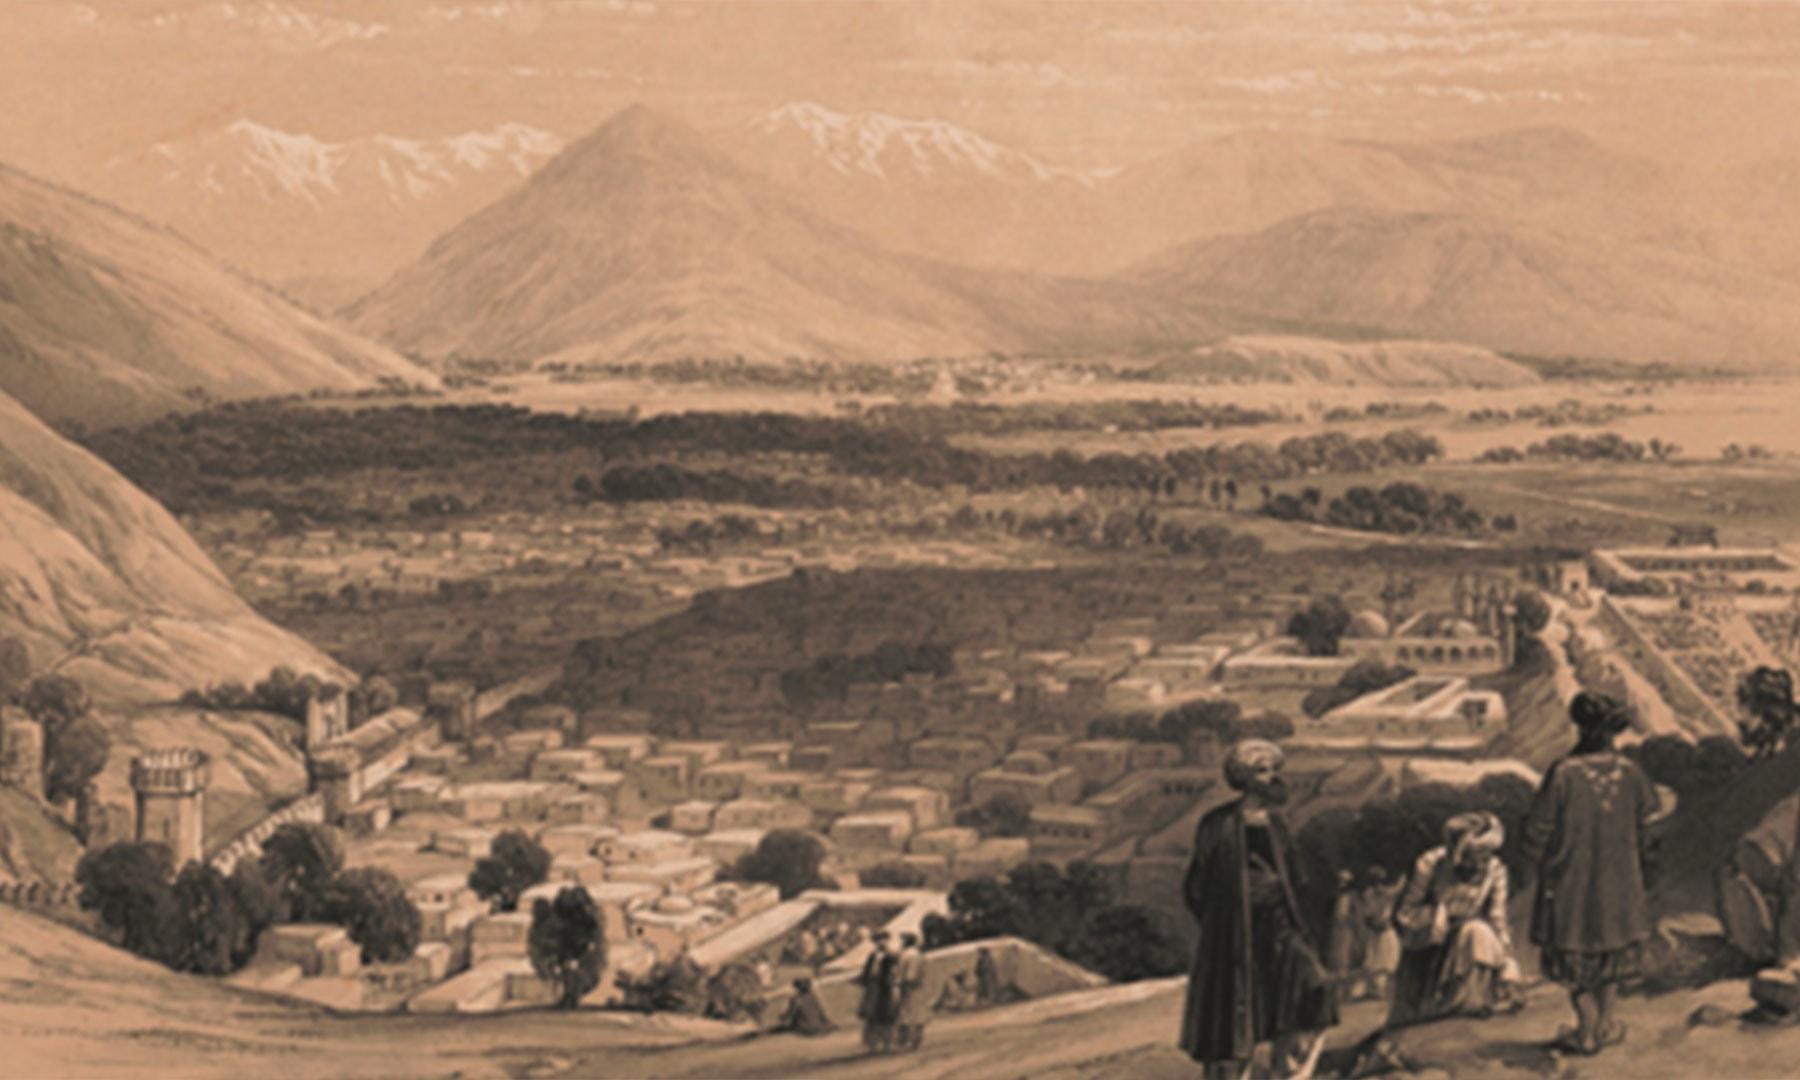 قلعہ بالا حصار اور شہرِ کابل